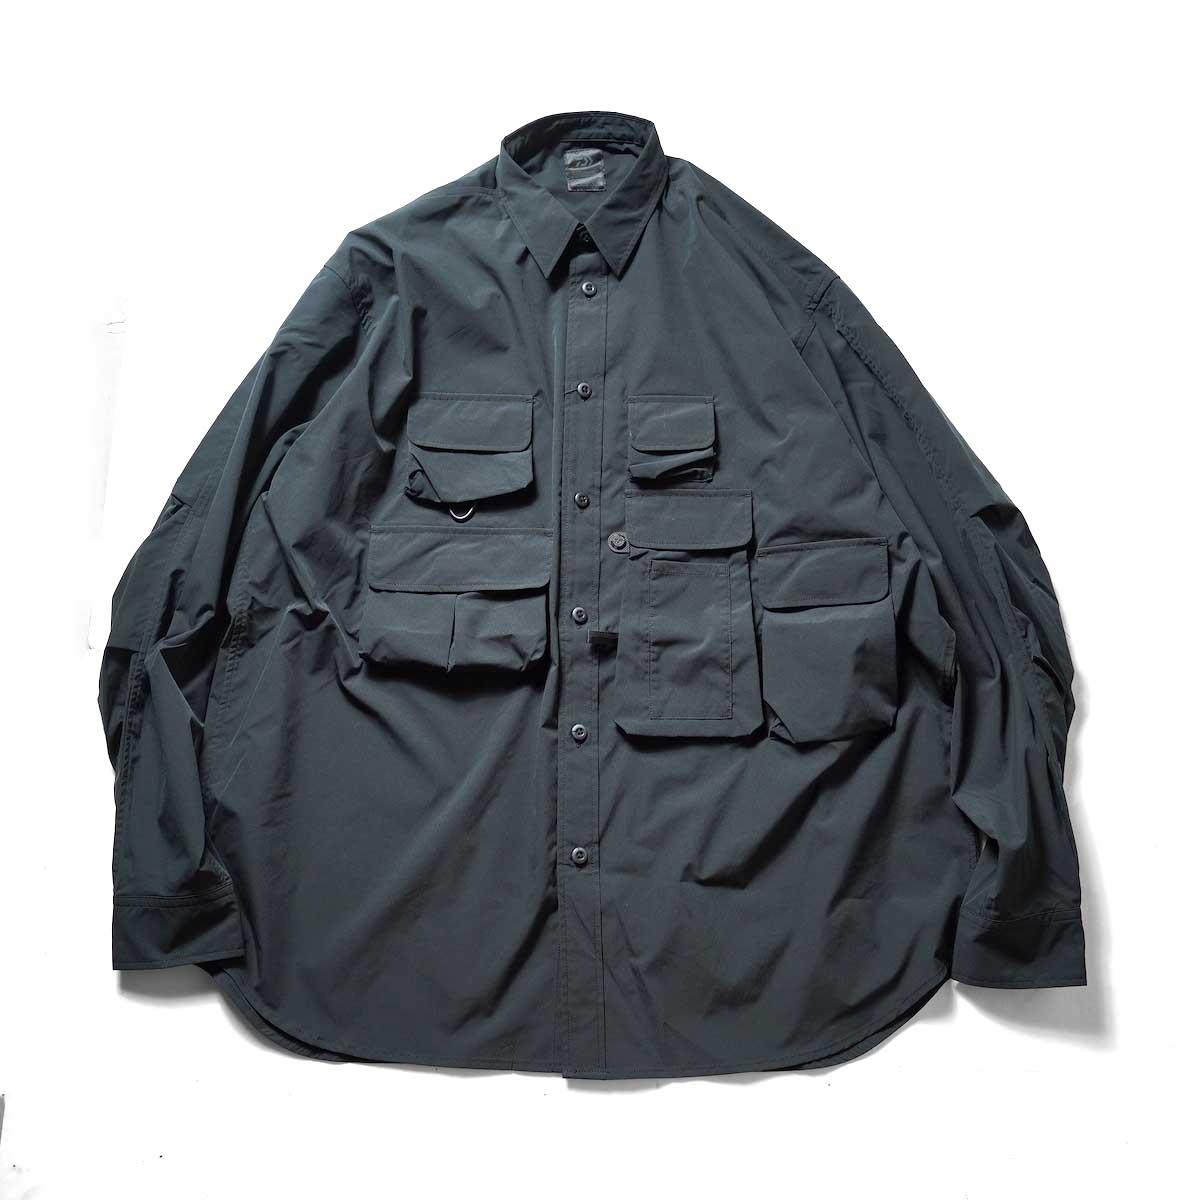 DAIWA PIER39 / Tech Angler's Shirt L/S (Black)